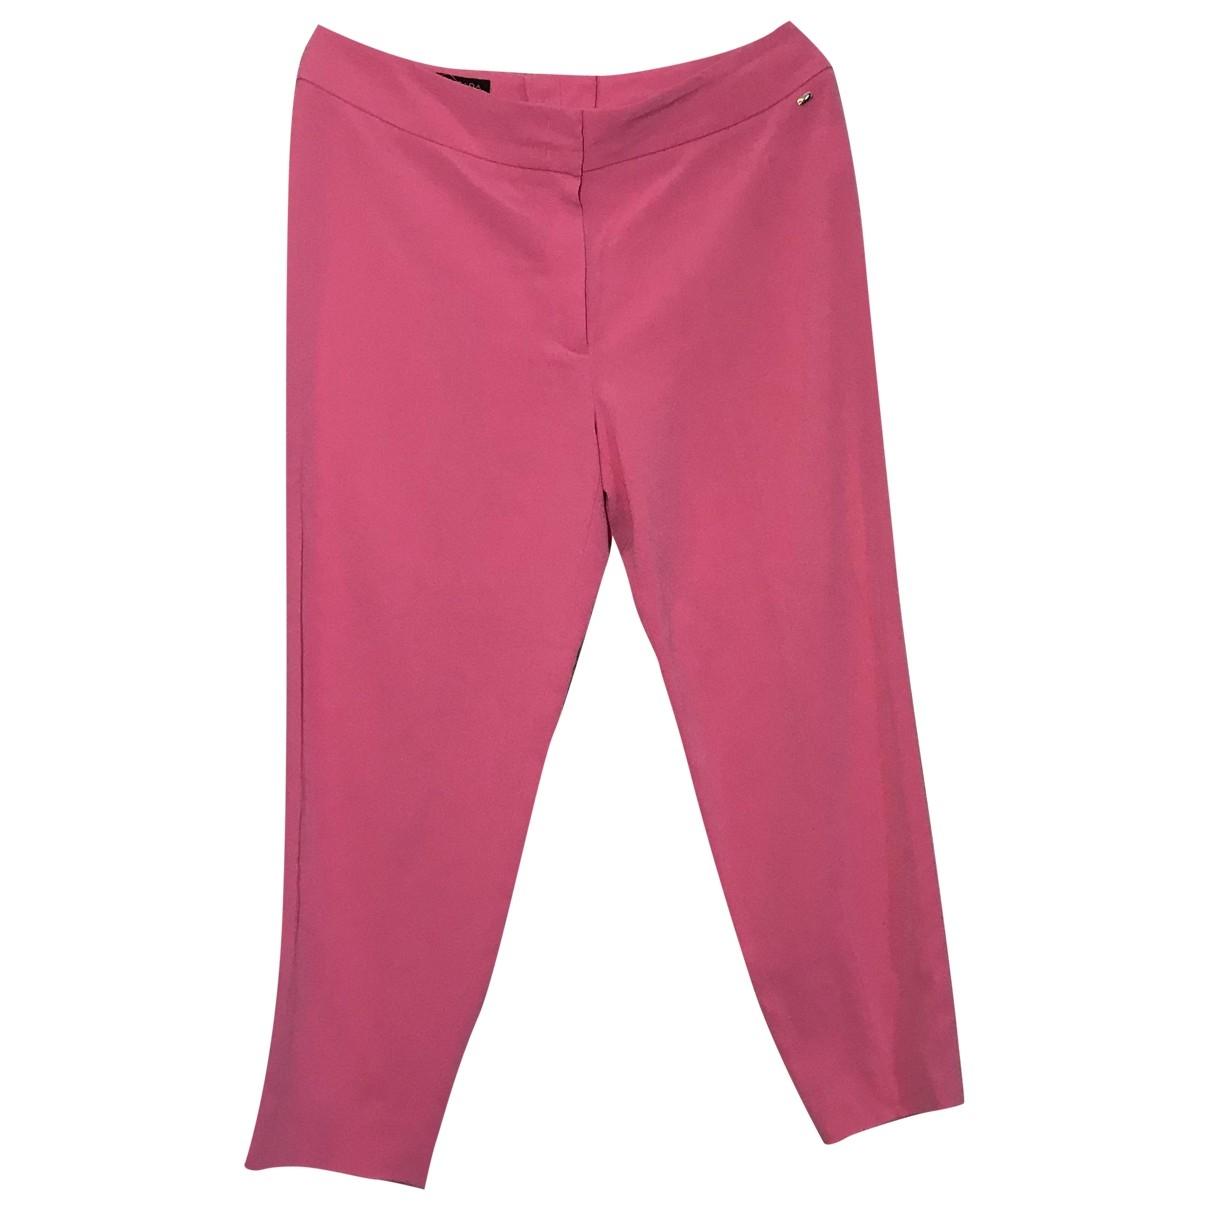 Pantalon en Sintetico Rosa Escada